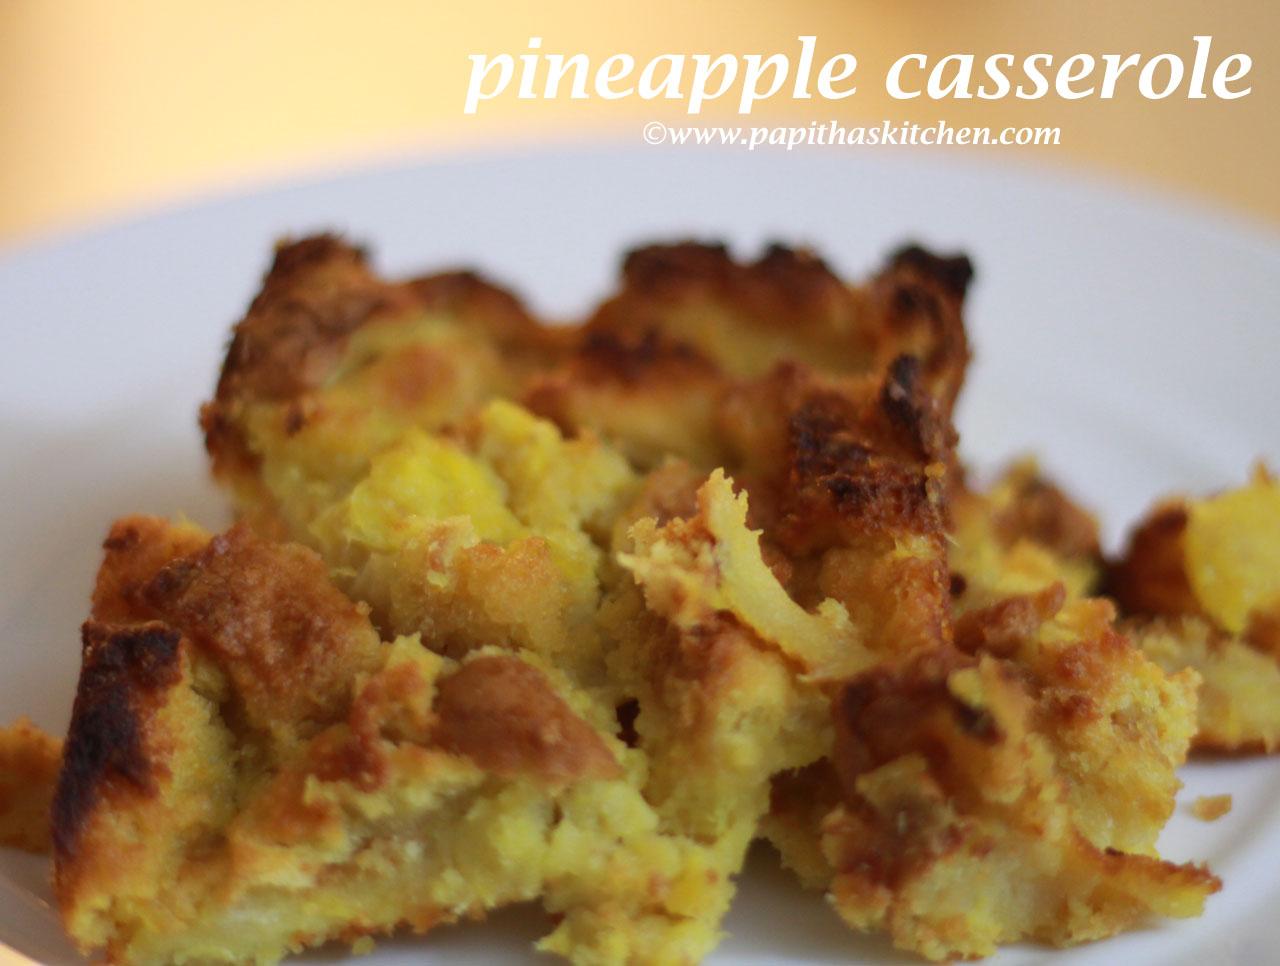 pineapple casserole